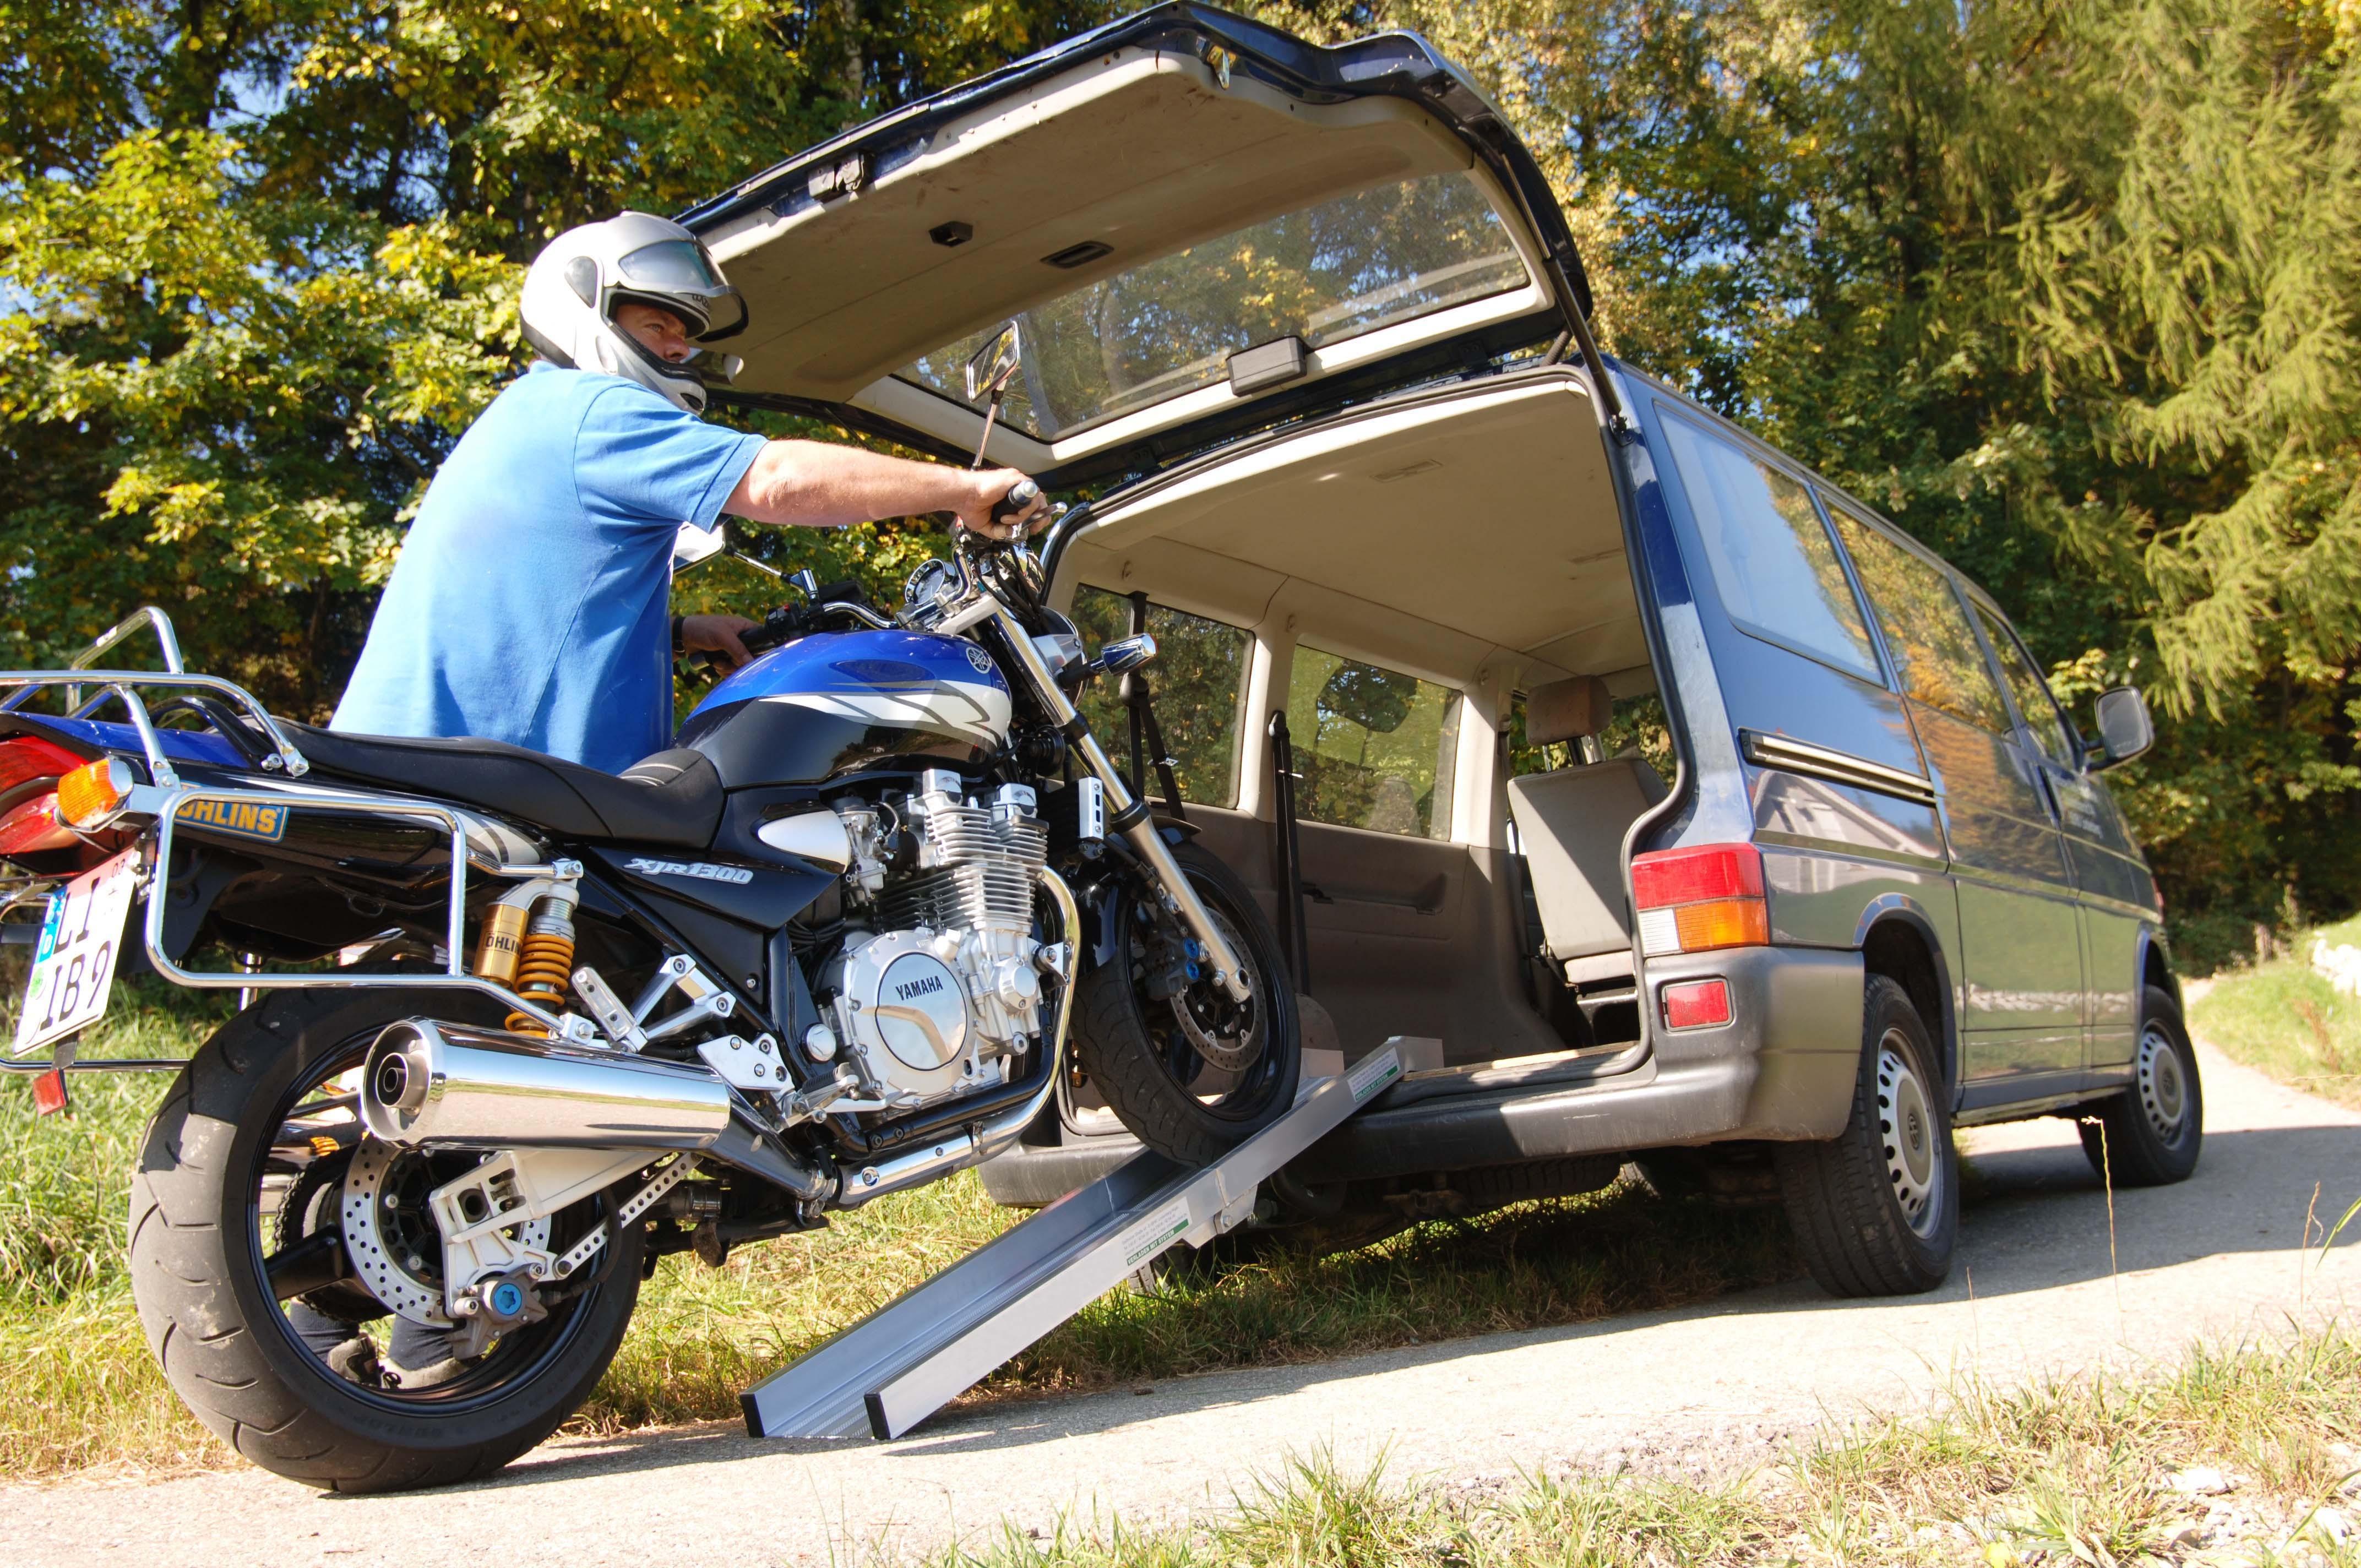 Garden & Motorcycle Folding Ramps 2000mm Long, 800Kg Capacity, 195mm Wide